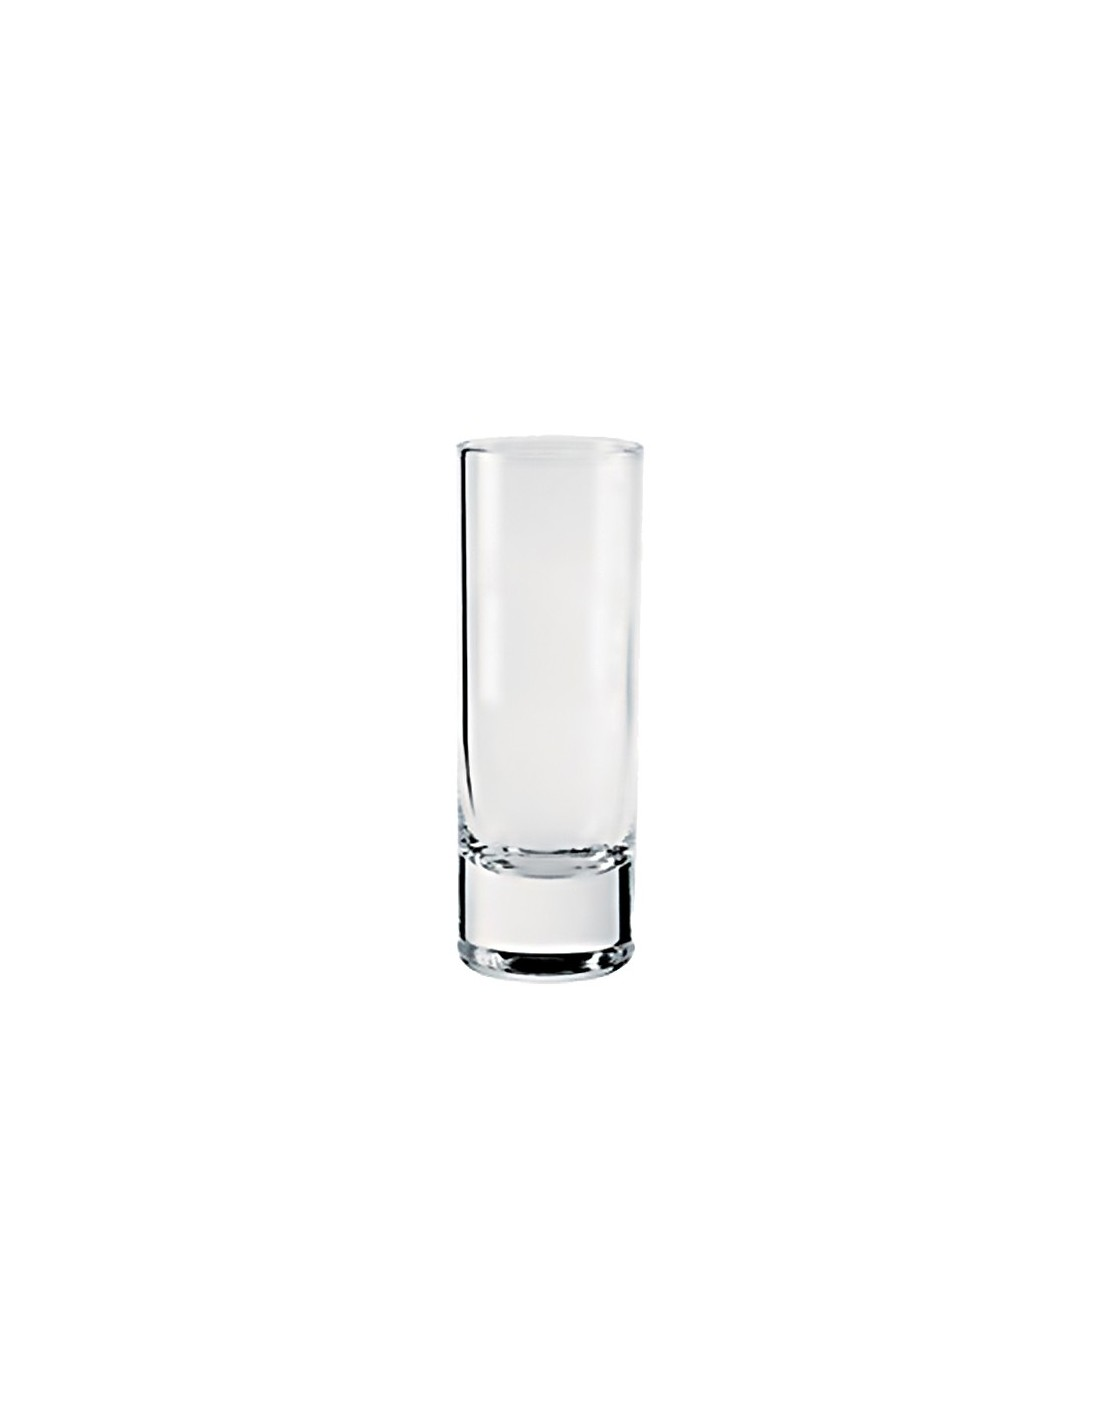 Vaso chupito indro vodka 3 8 x 10 5cm 60 ml 6 uds for Vasos chupito personalizados